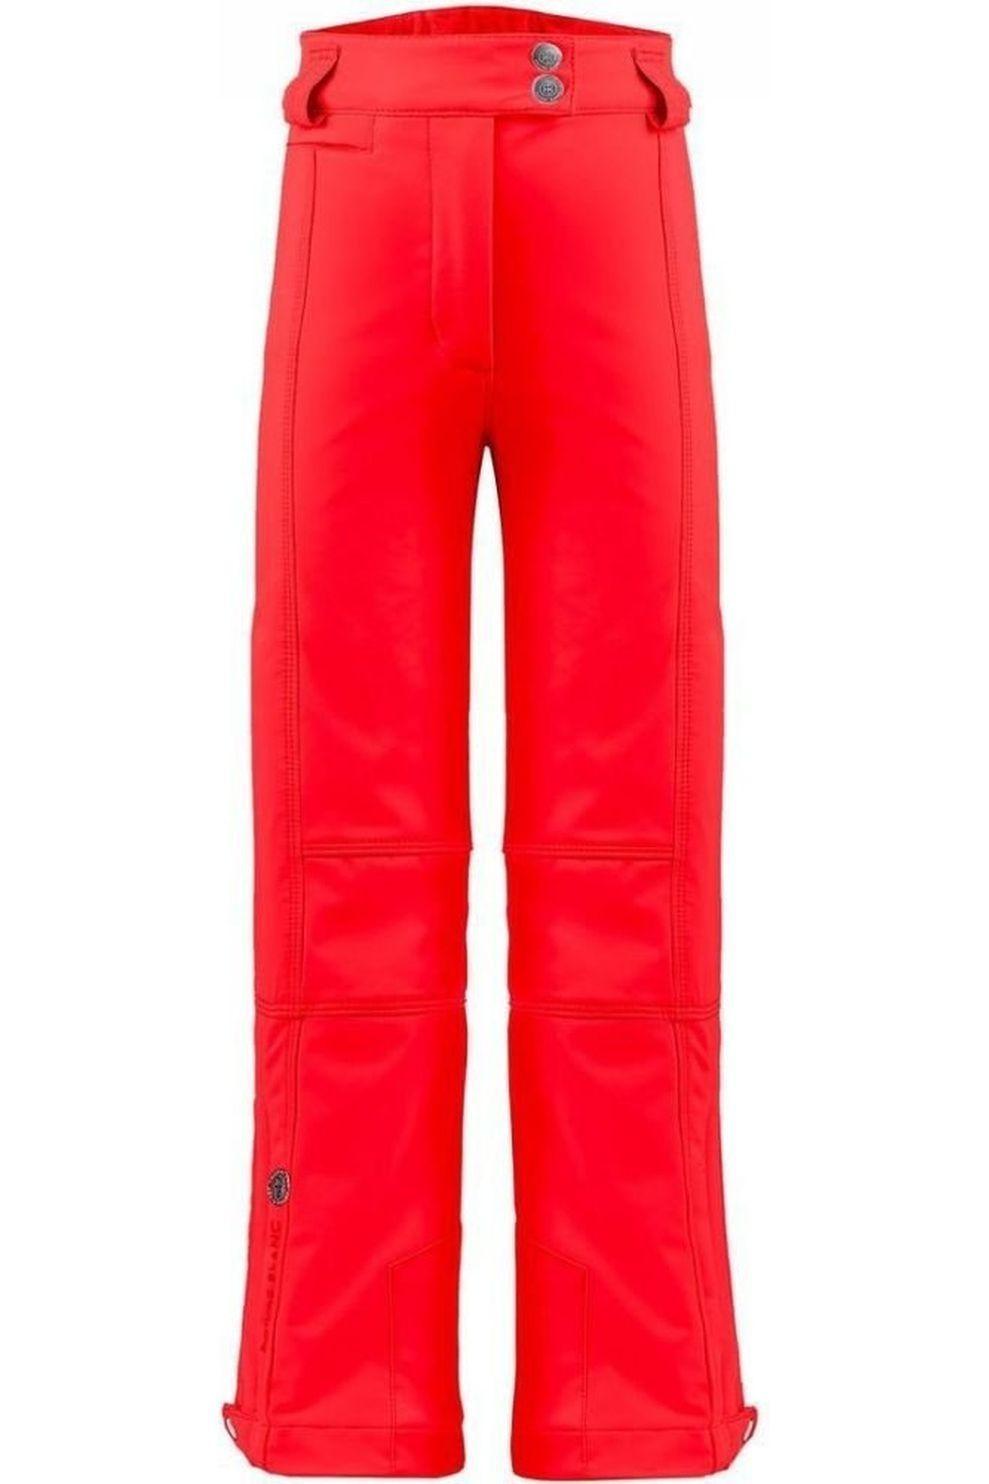 Poivre Blanc Skibroek Stretch Ski voor meisjes - Rood - Maten: 128, 152